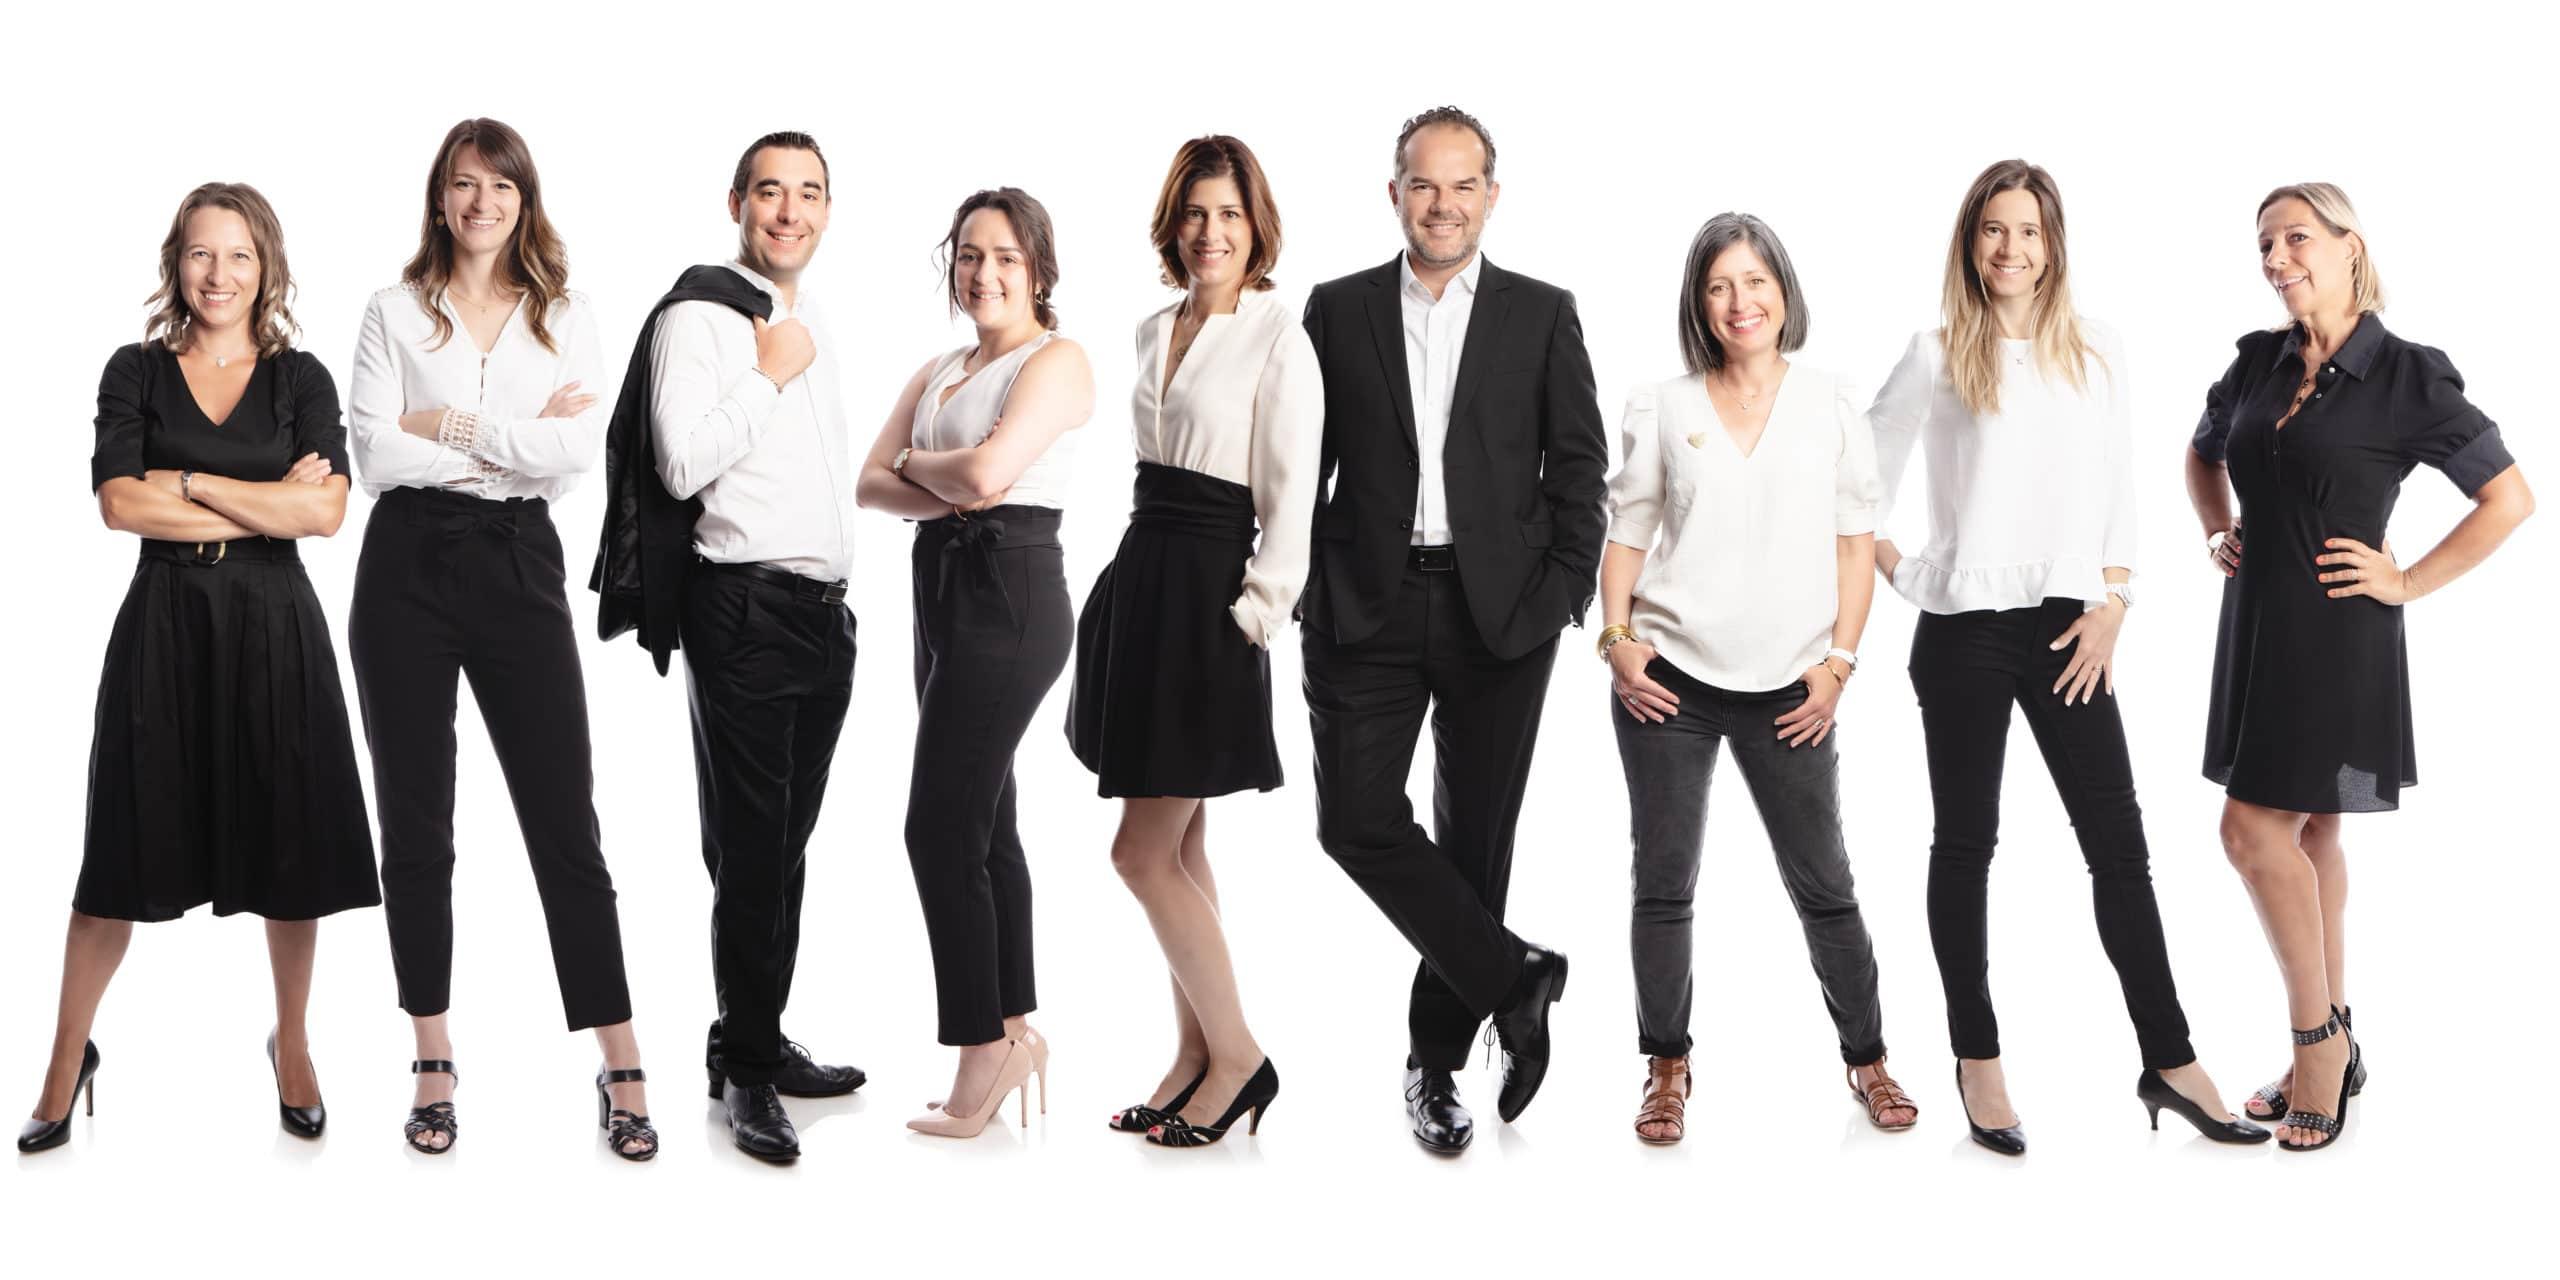 consultants cabinet de recrutement potentiel